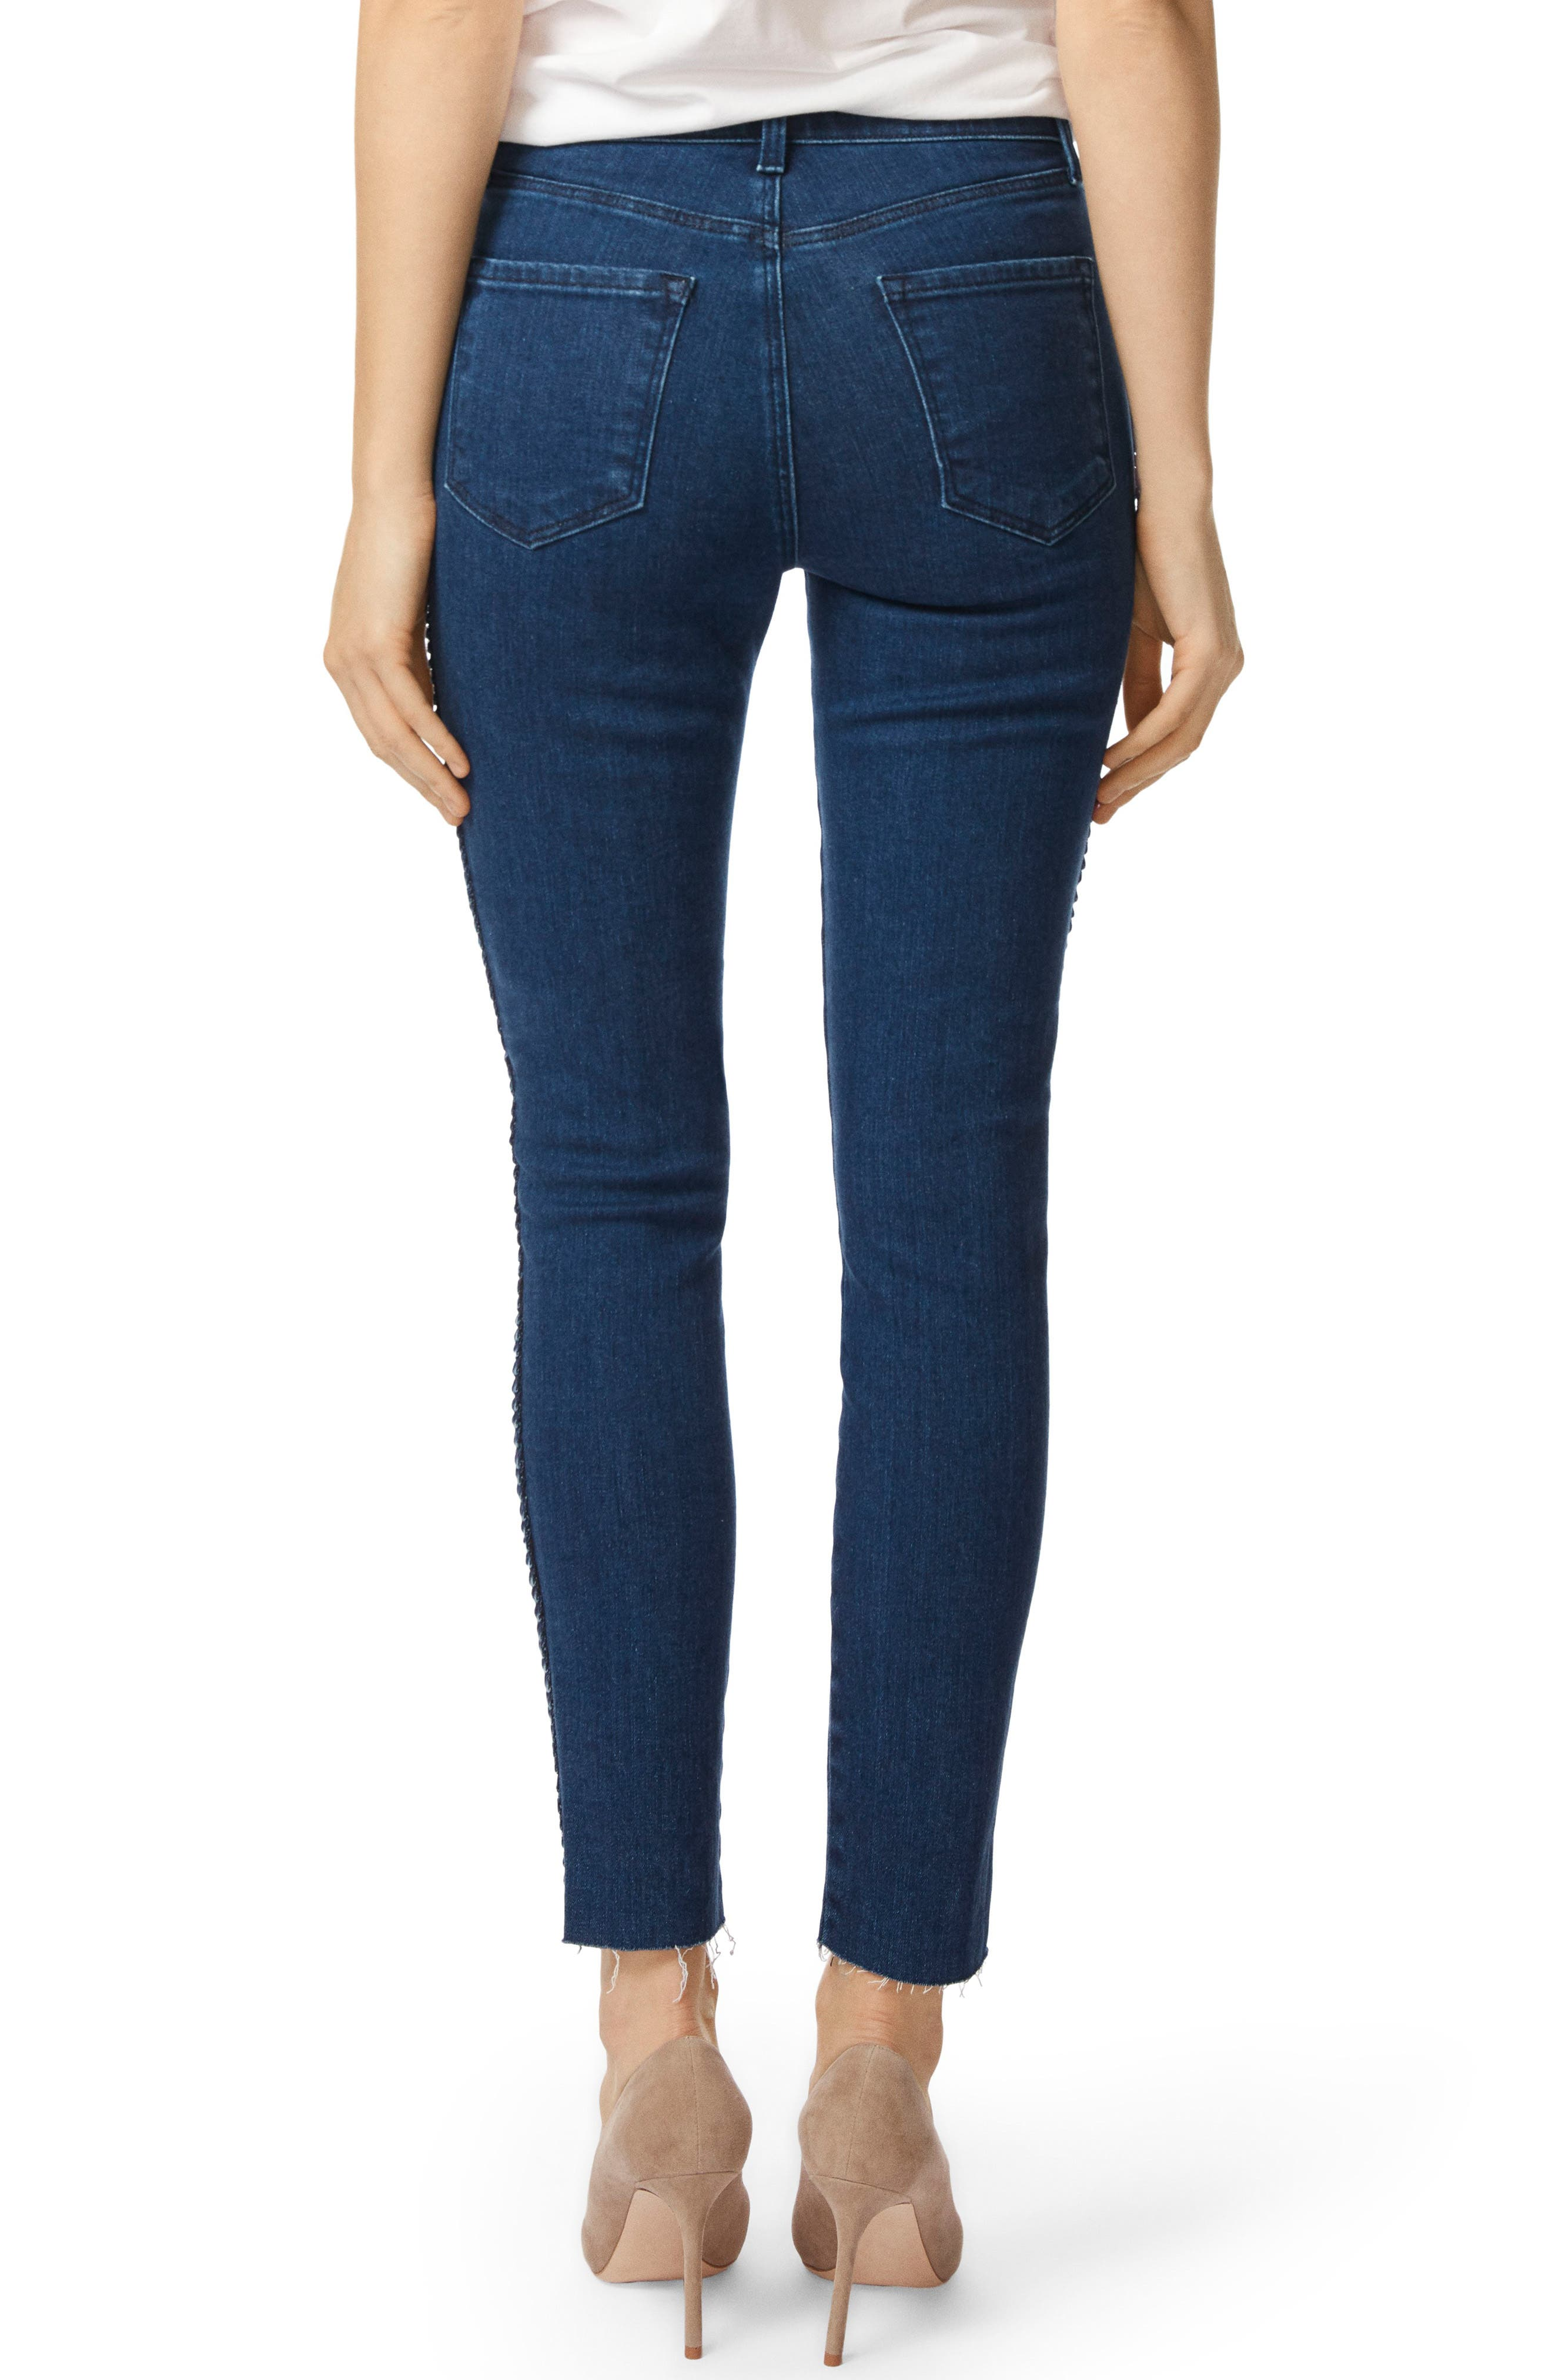 J BRAND,                             Alana High Waist Ankle Skinny Jeans,                             Main thumbnail 1, color,                             405